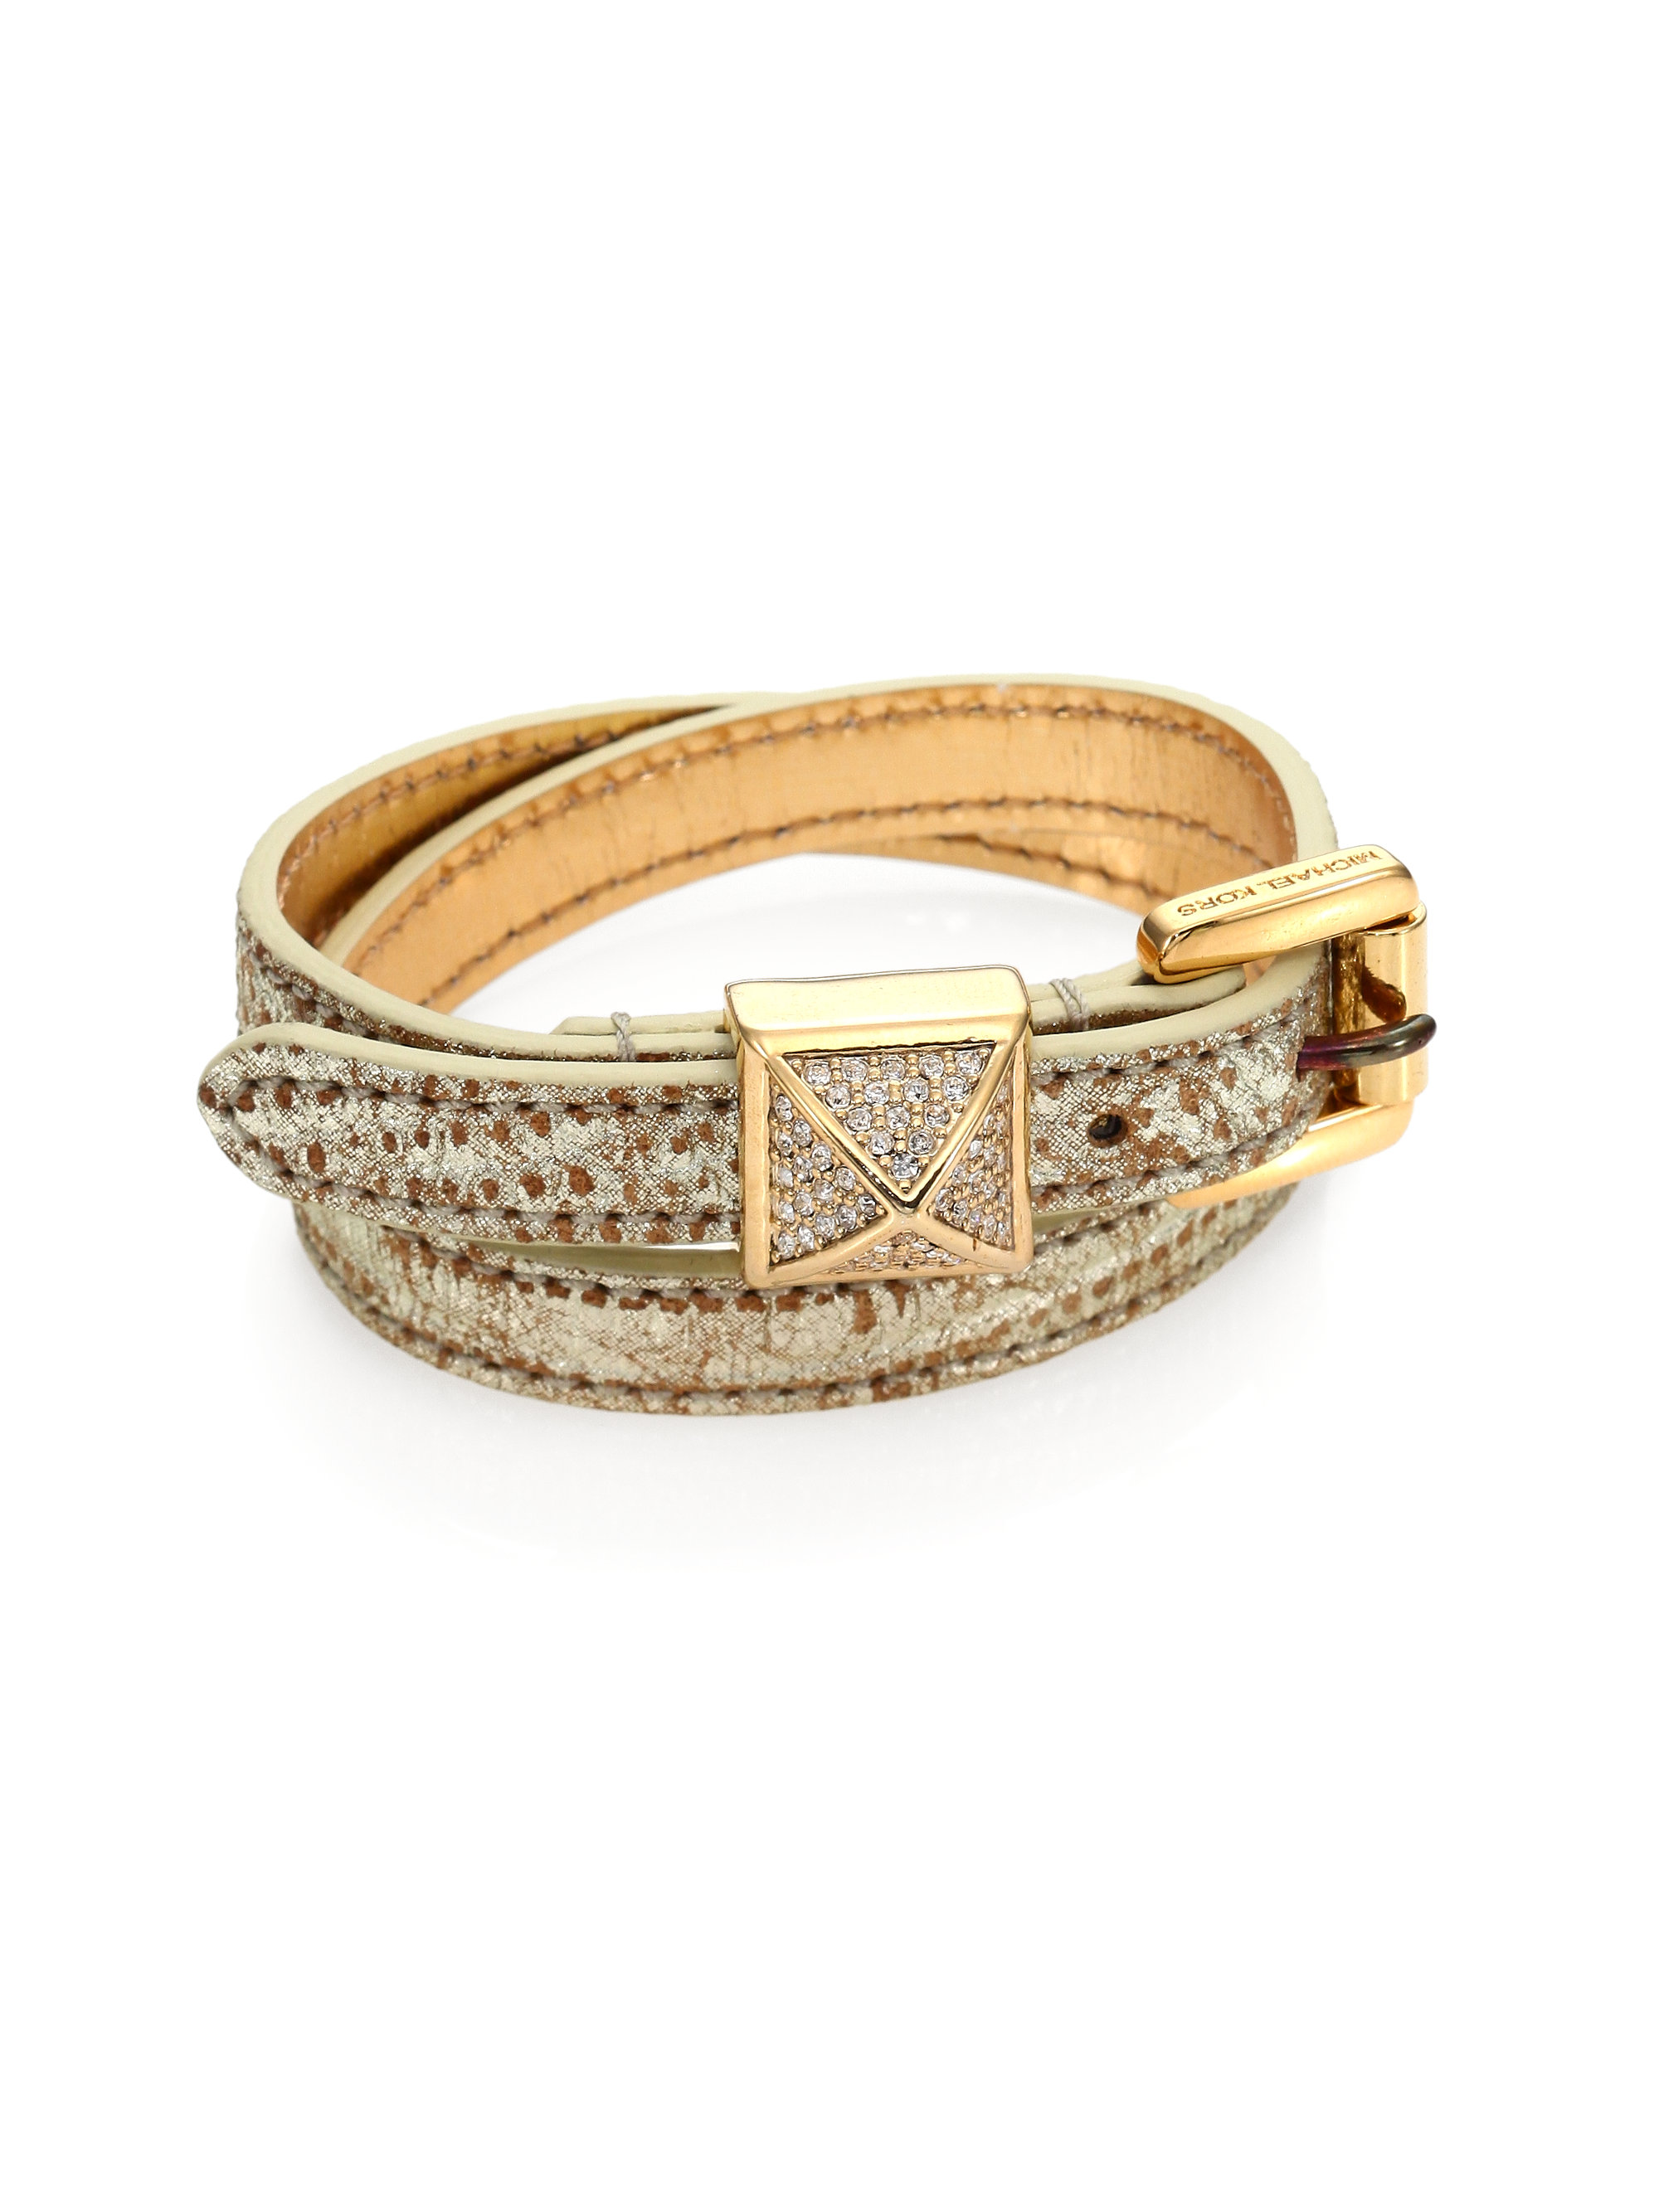 lyst michael kors pythonembossed leather wrap bracelet. Black Bedroom Furniture Sets. Home Design Ideas